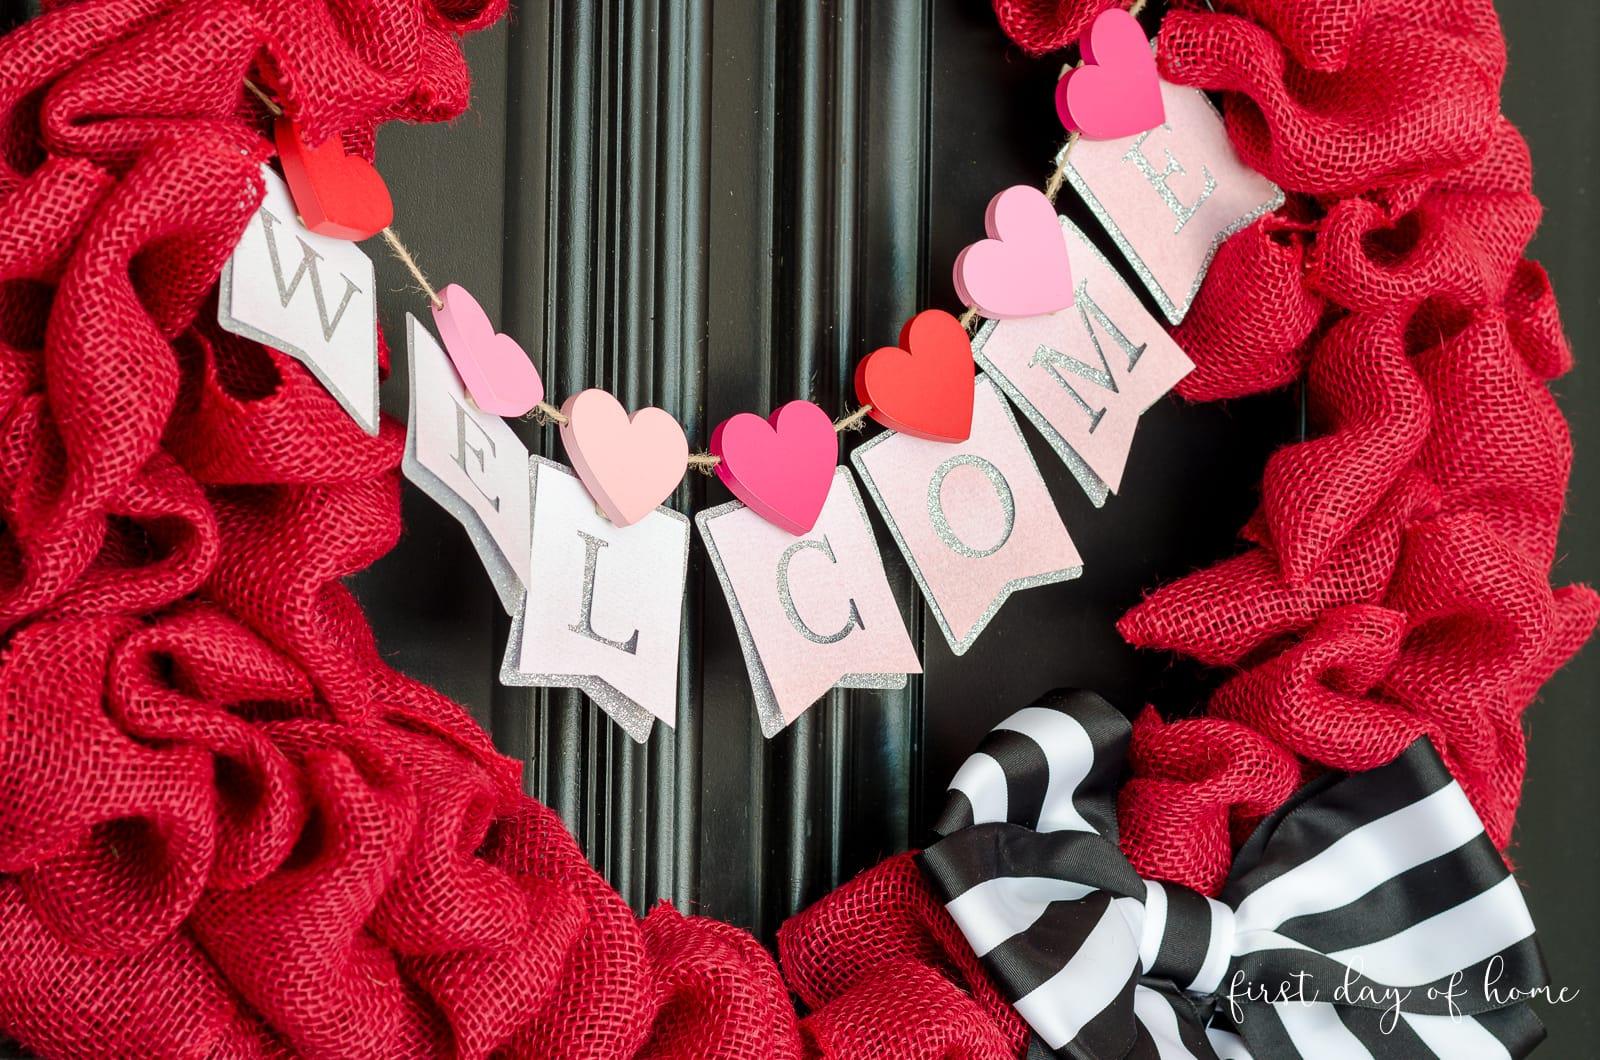 Burlap wreath with banner